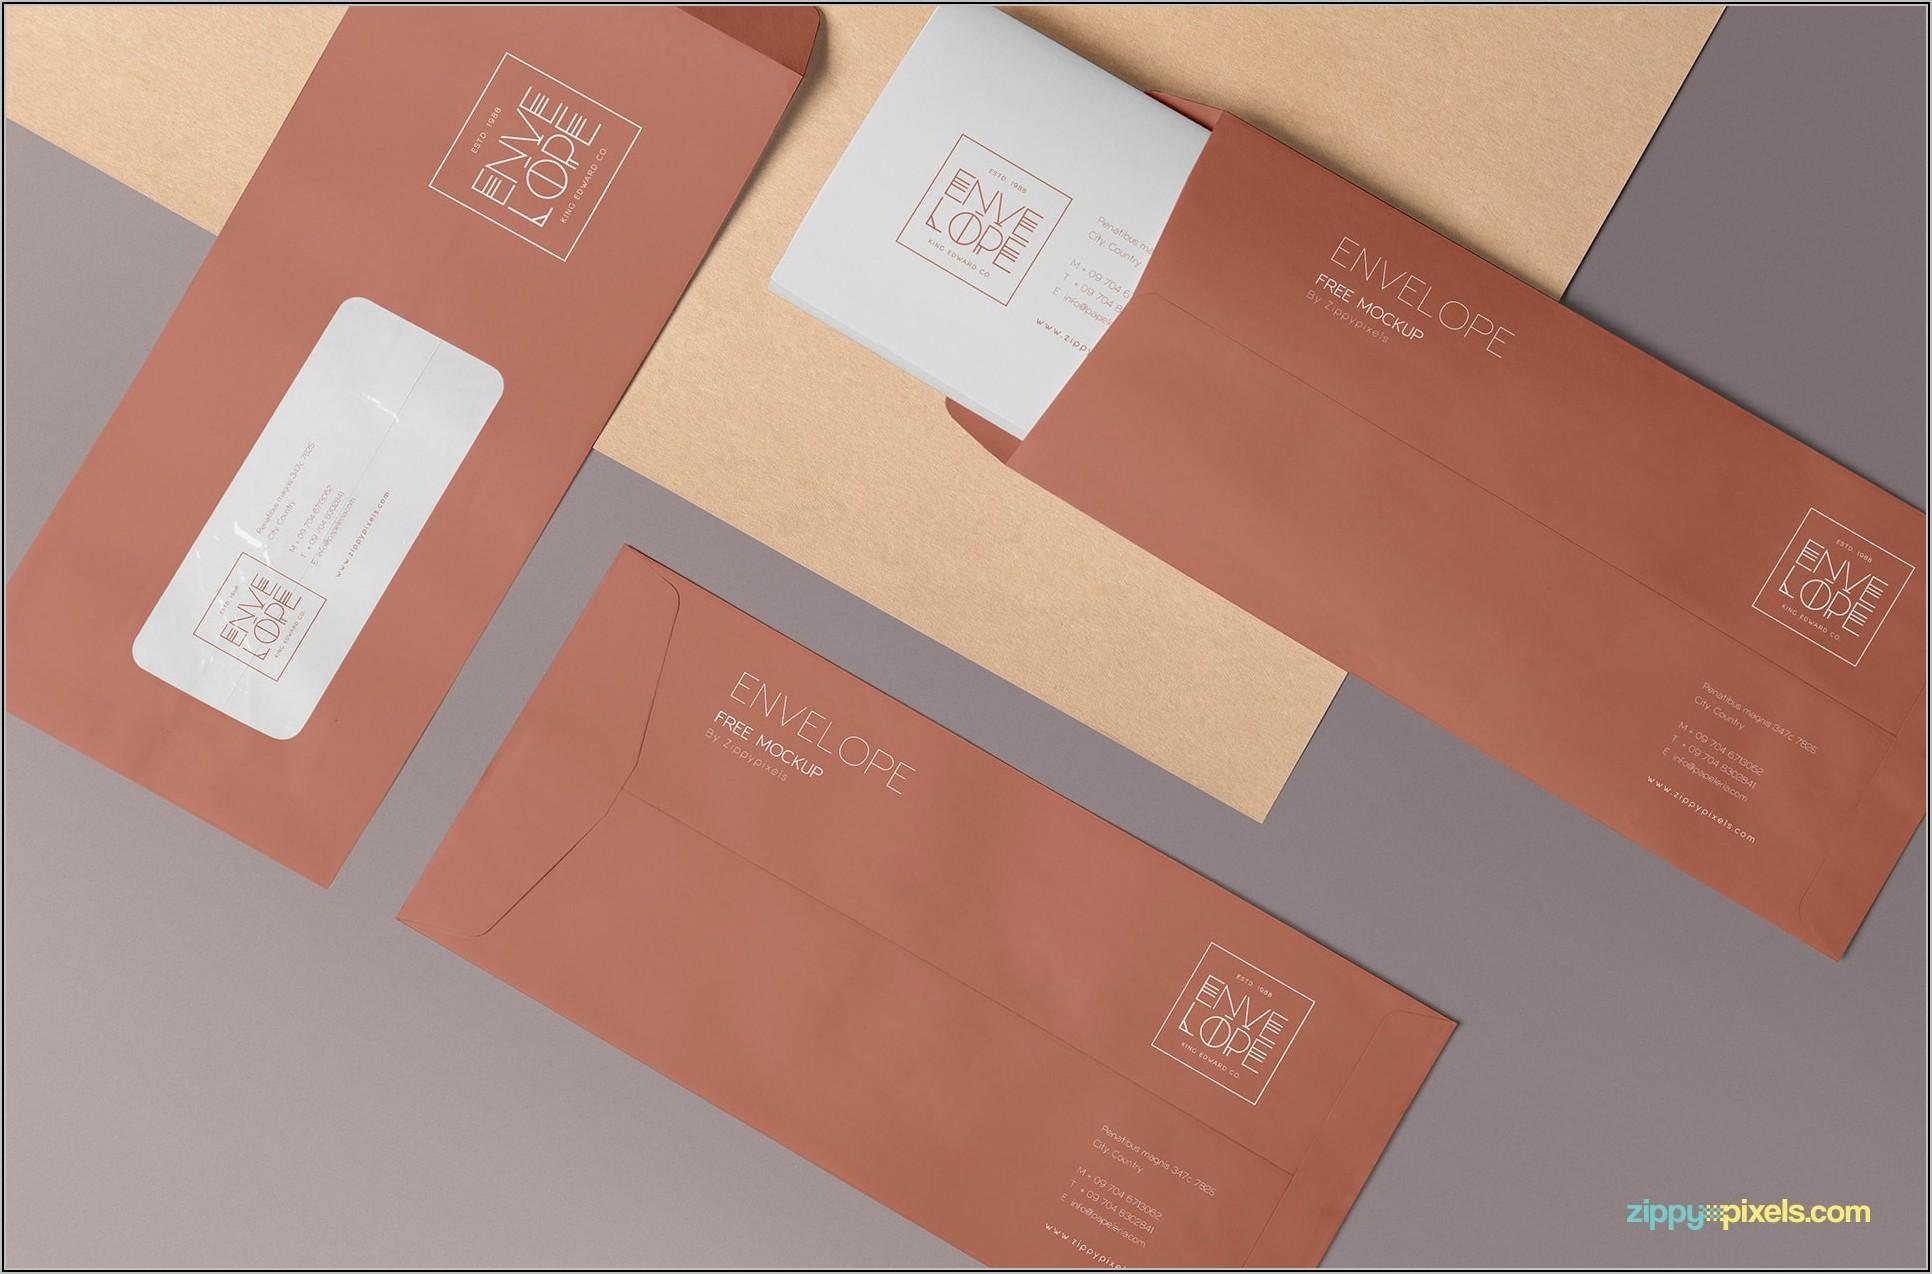 A4 Envelope Mockup Free Download